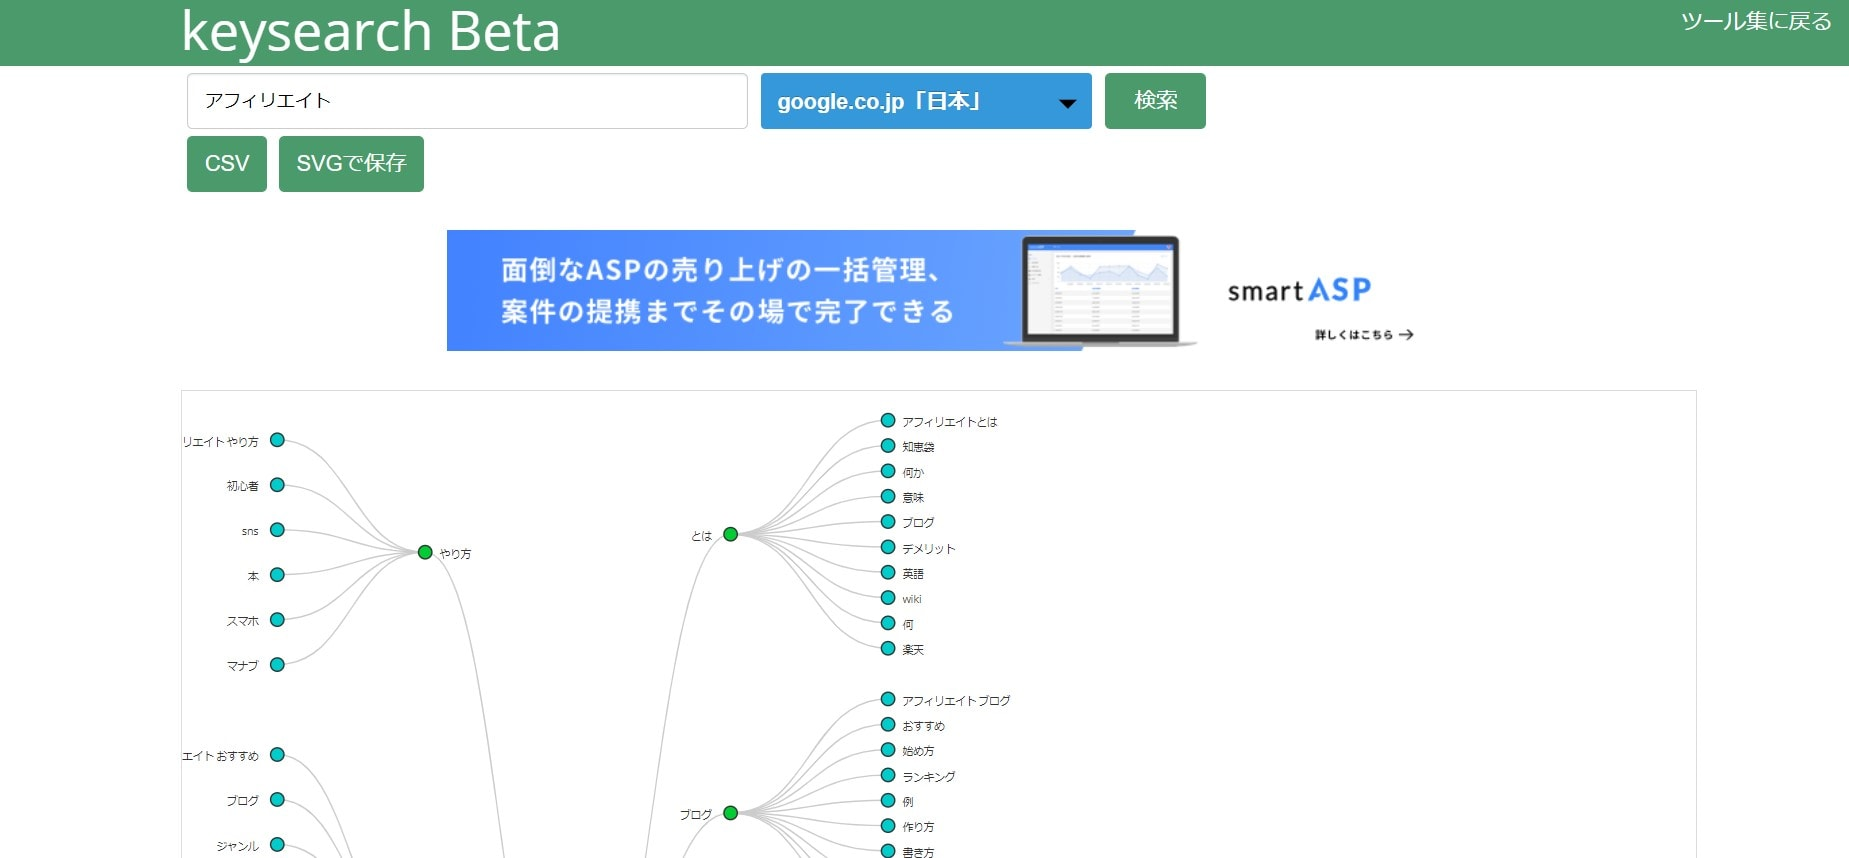 keysearch Betaの画像